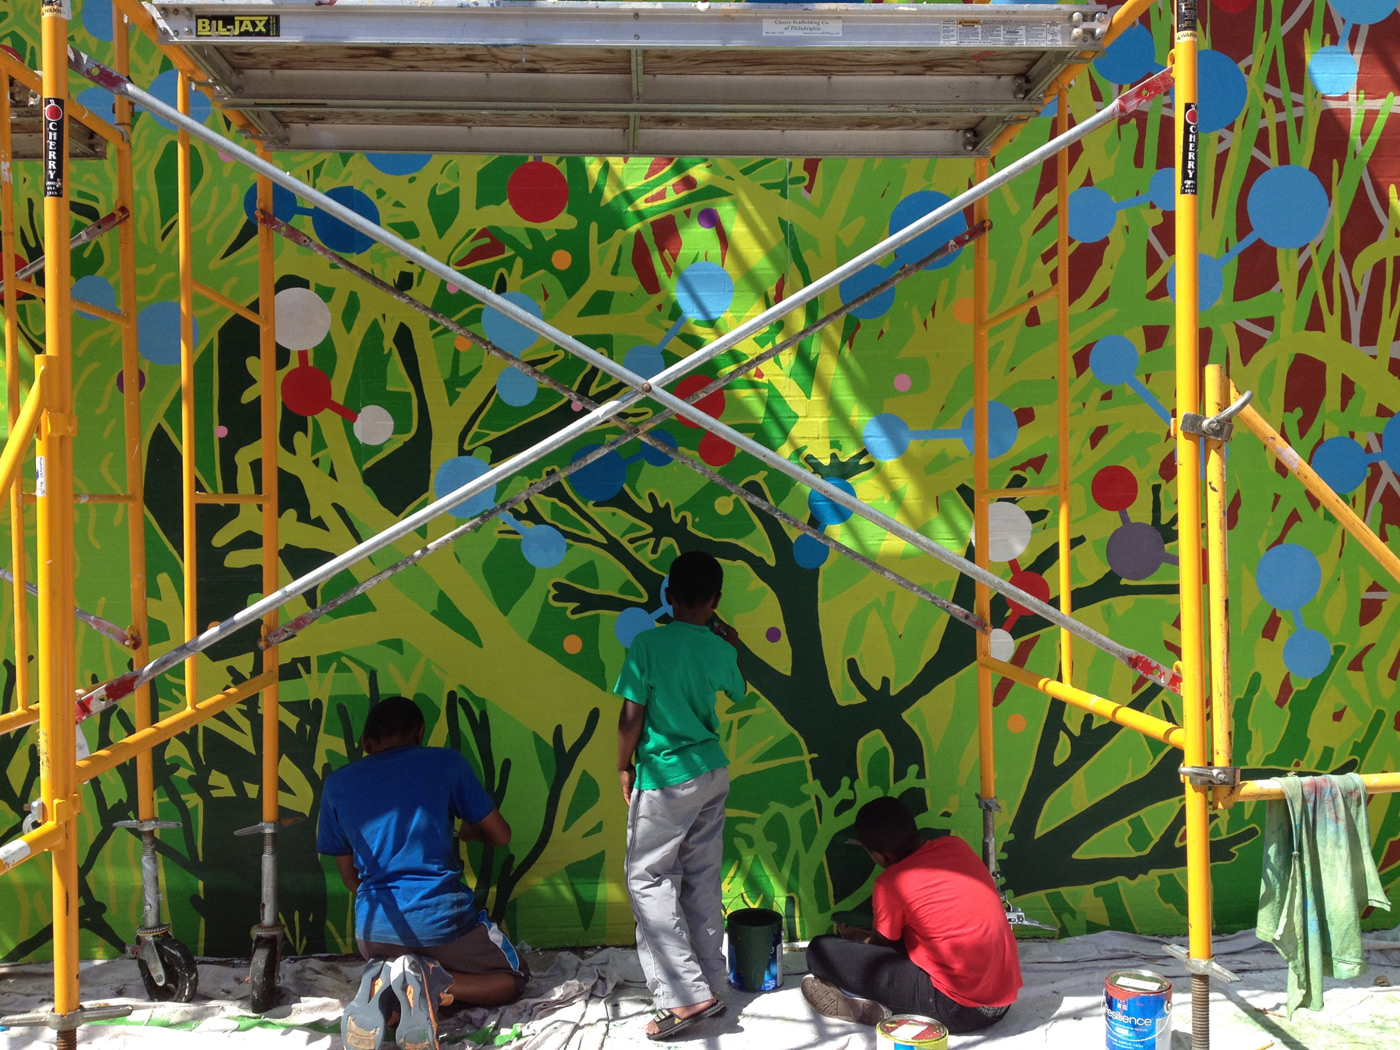 12.Painting_Trees_on_Wall.jpg